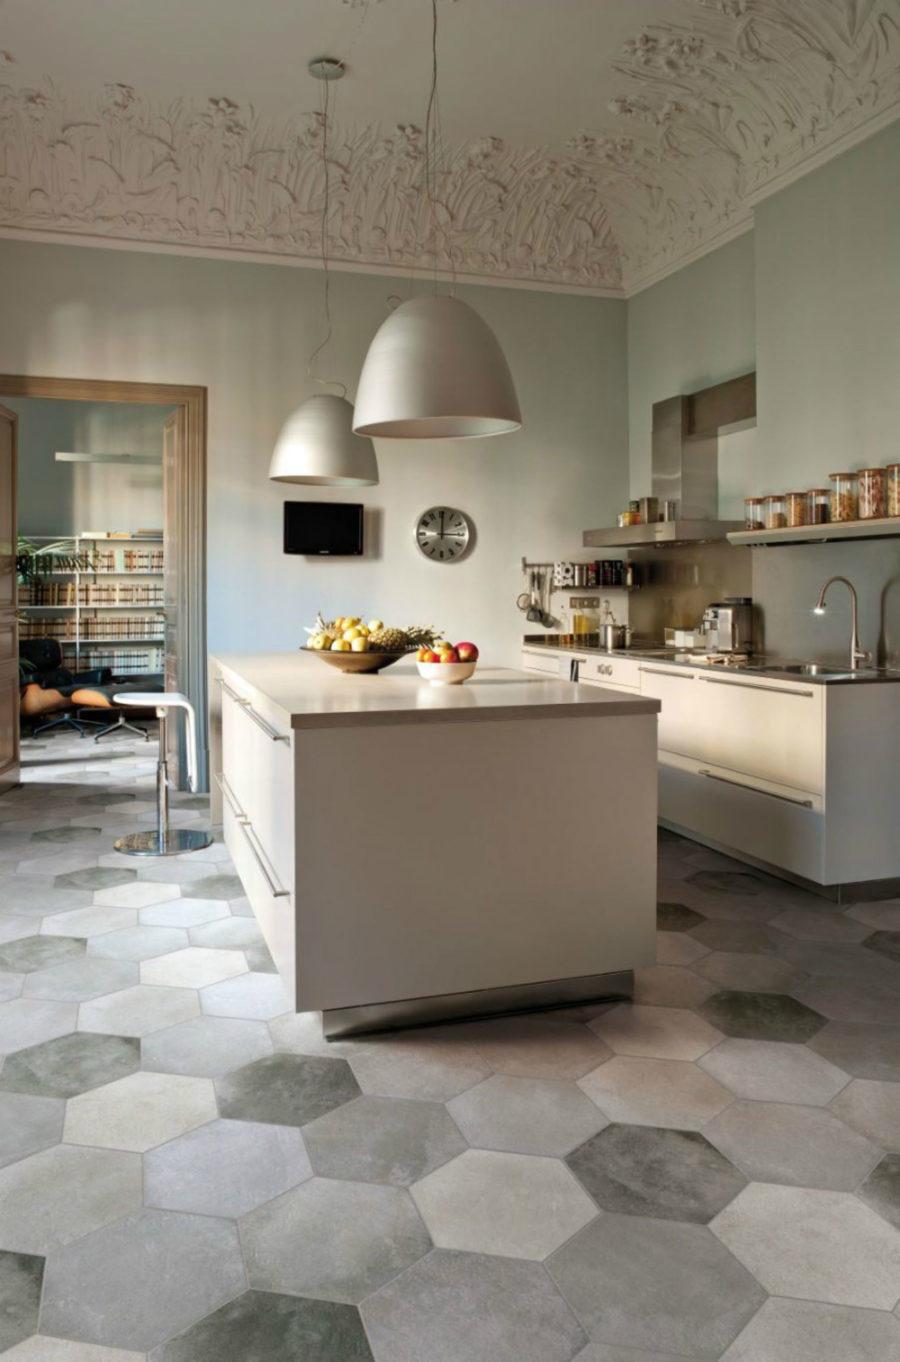 Molded ceiling Kitchen Design